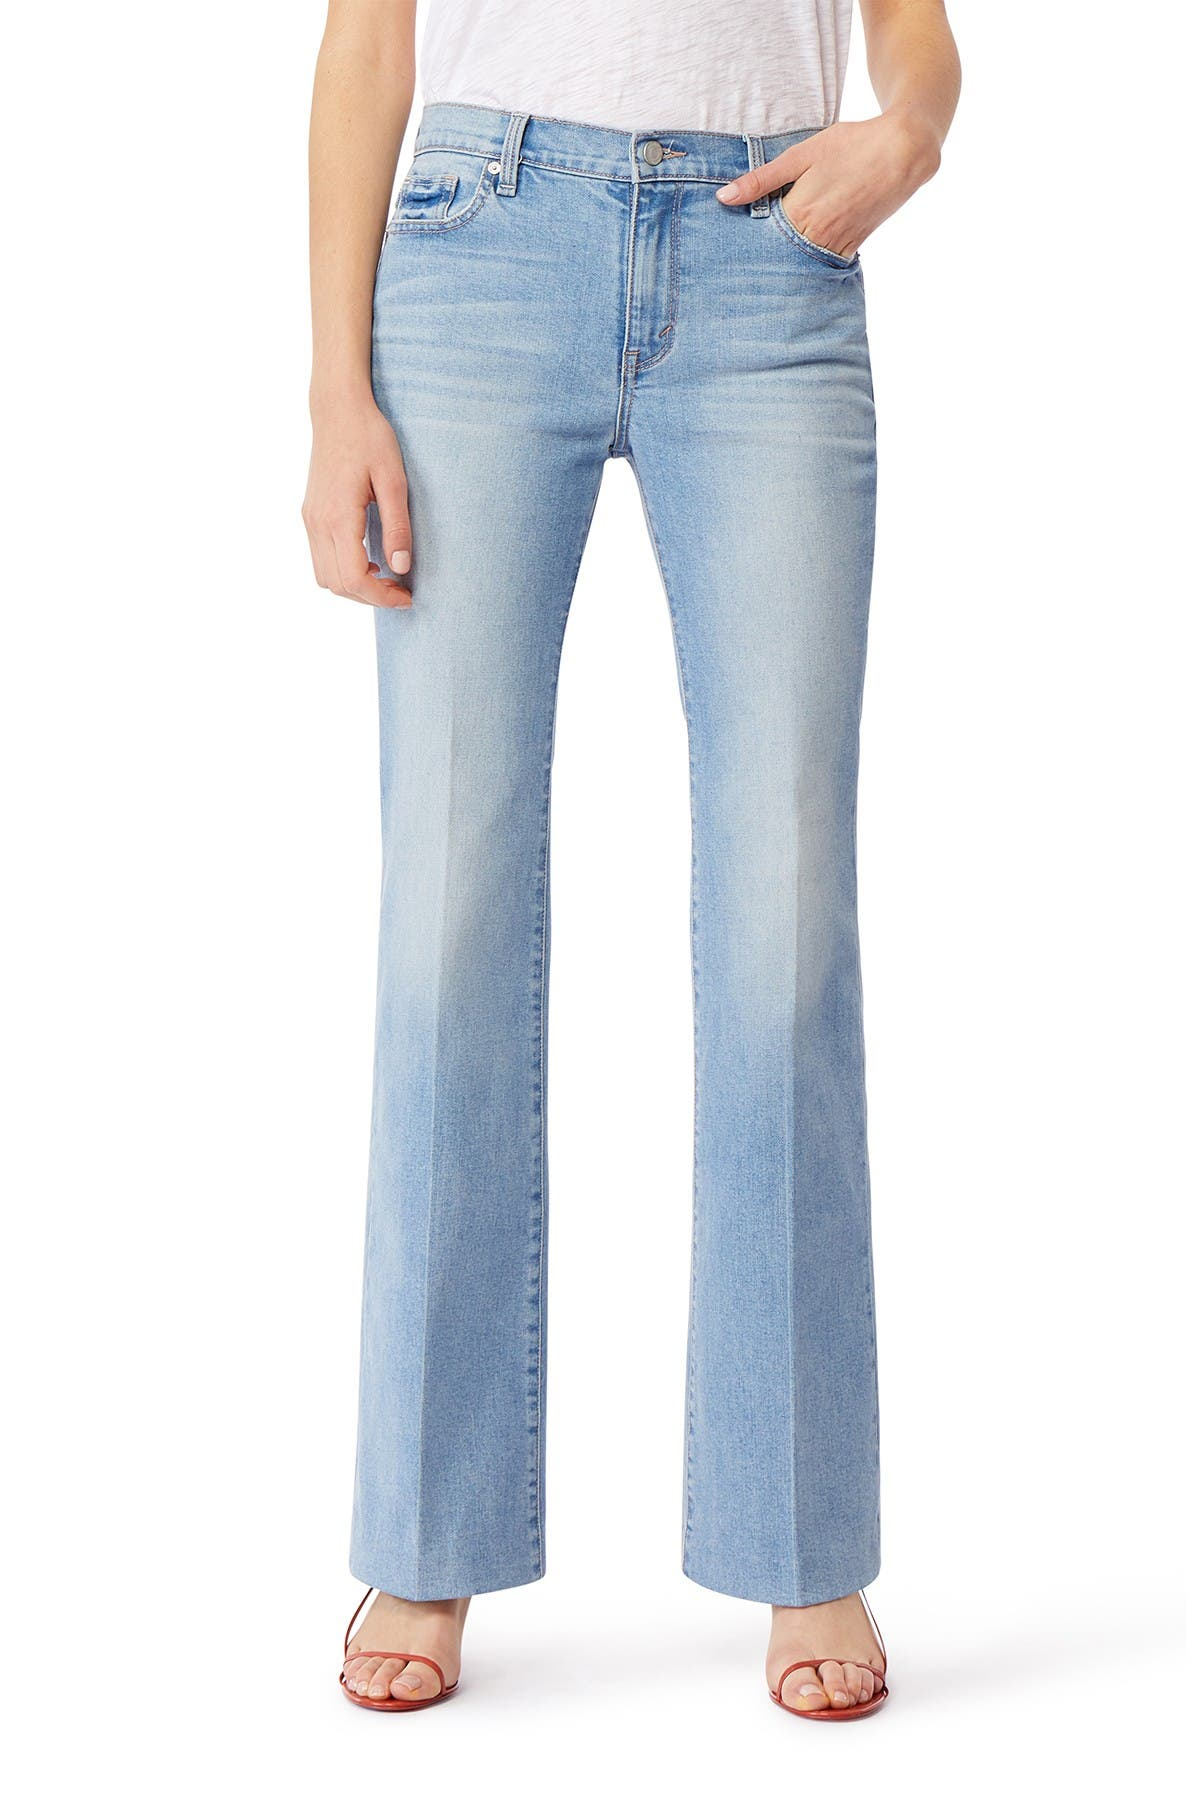 Image of Habitual Tess High Rise Flare Jeans